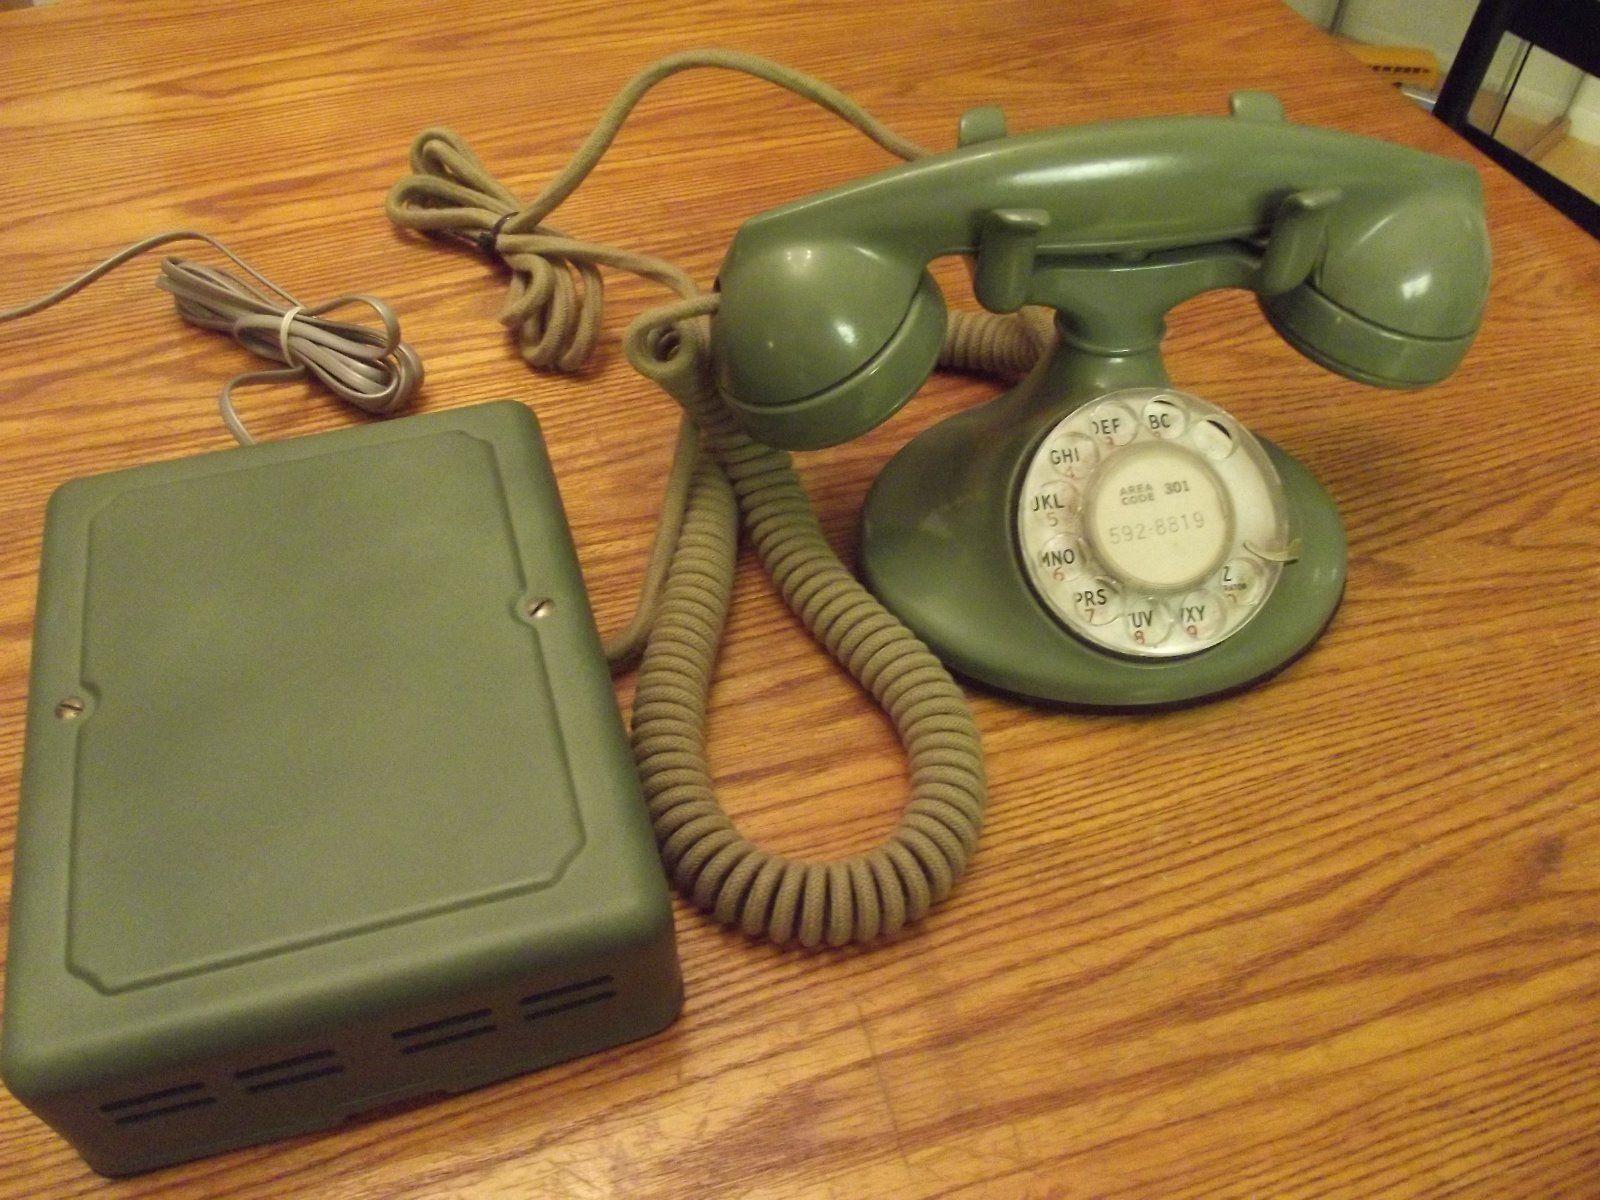 WESTERN ELECTRIC 202 DESK TELEPHONE W/F1 HANDSET,5H DIAL, & SUBSET | eBay